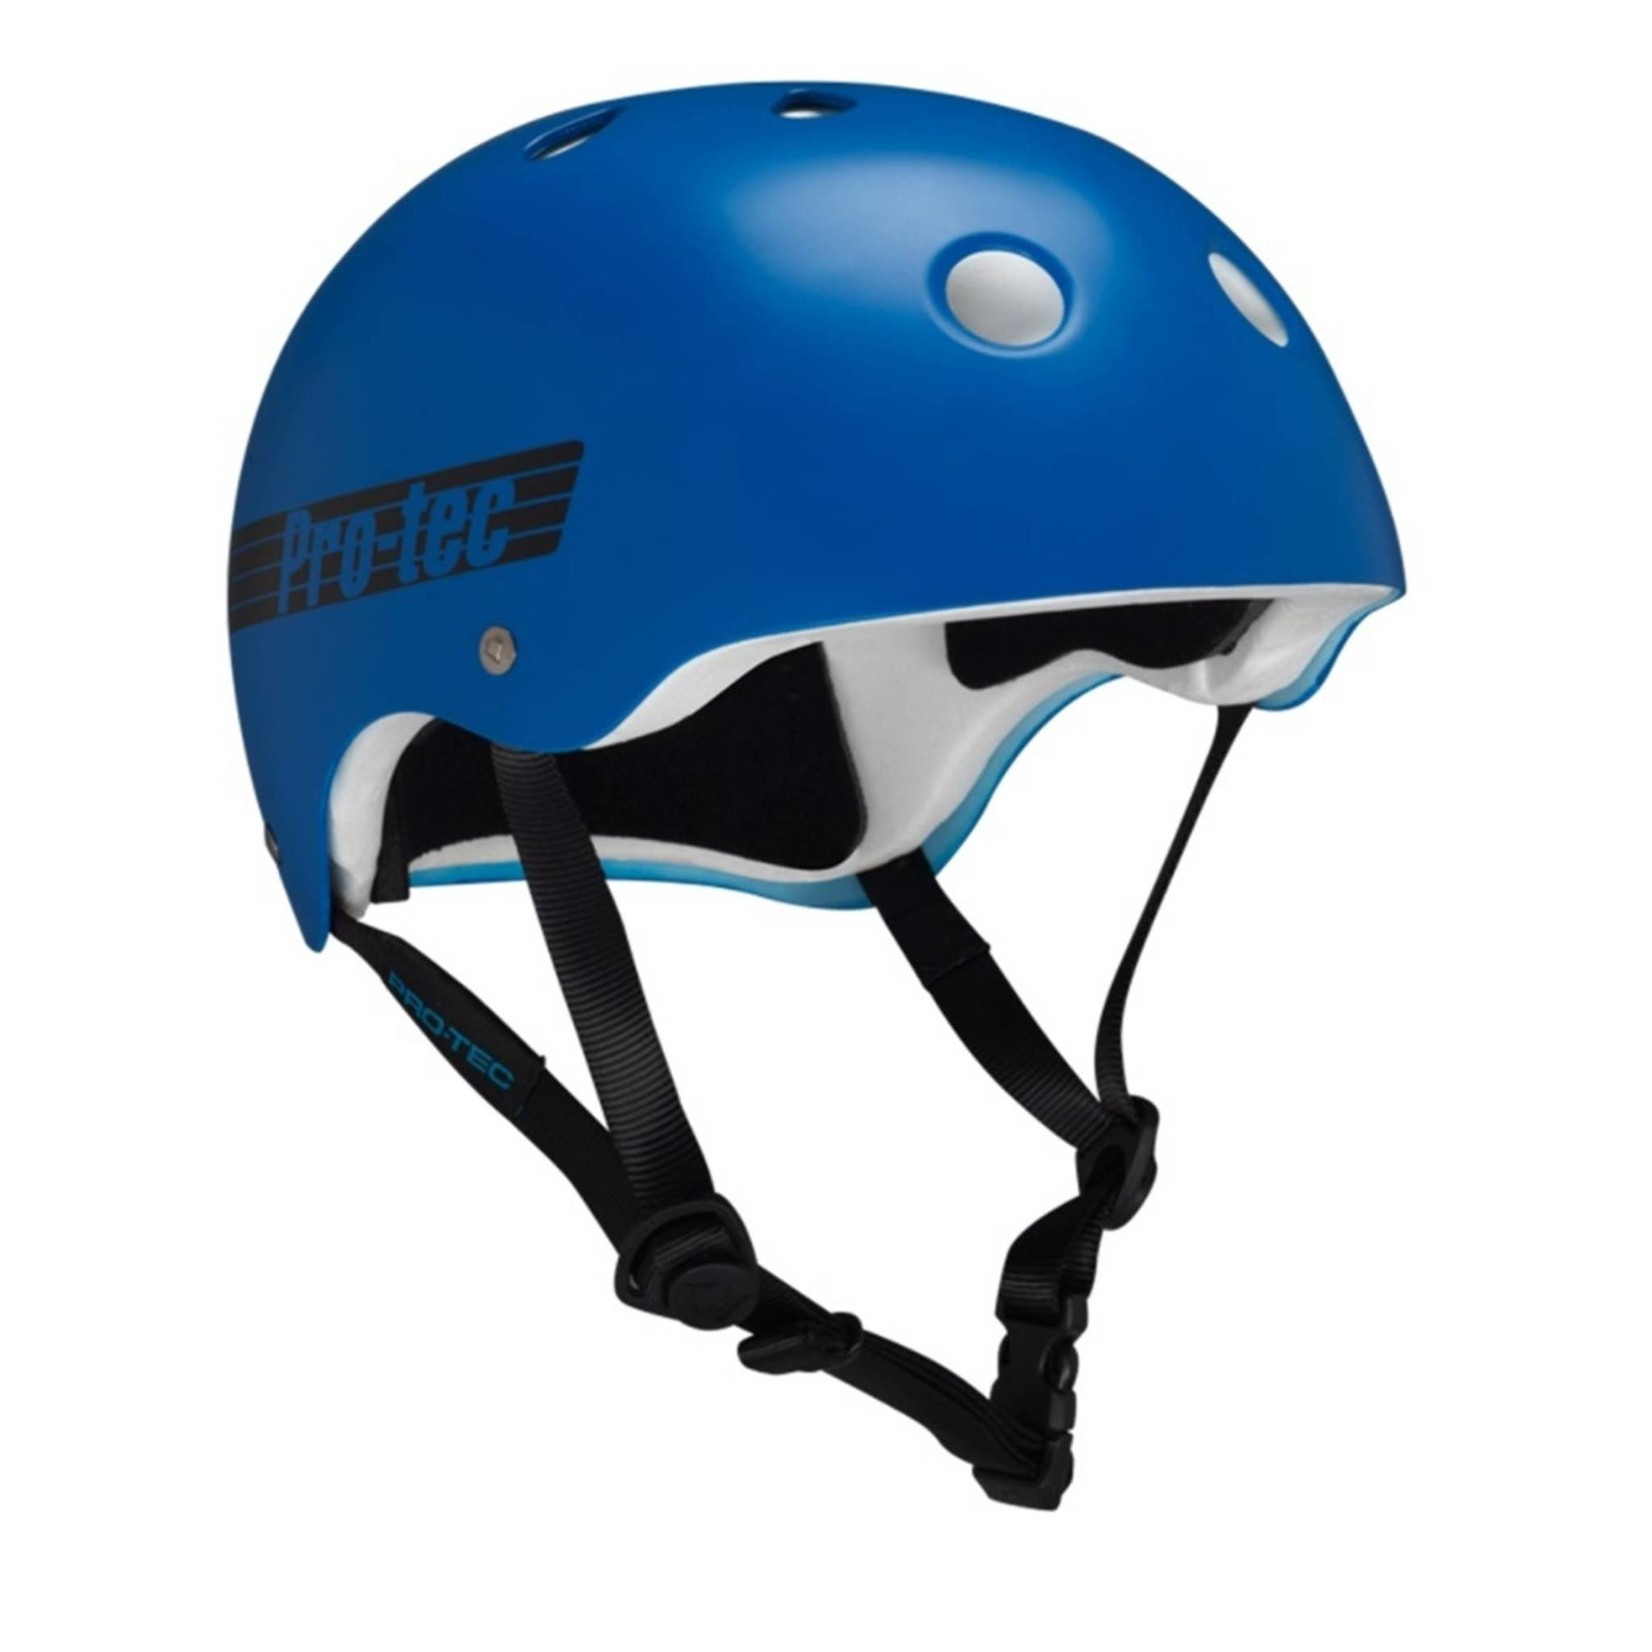 Protec Classic Blue Helmet Large